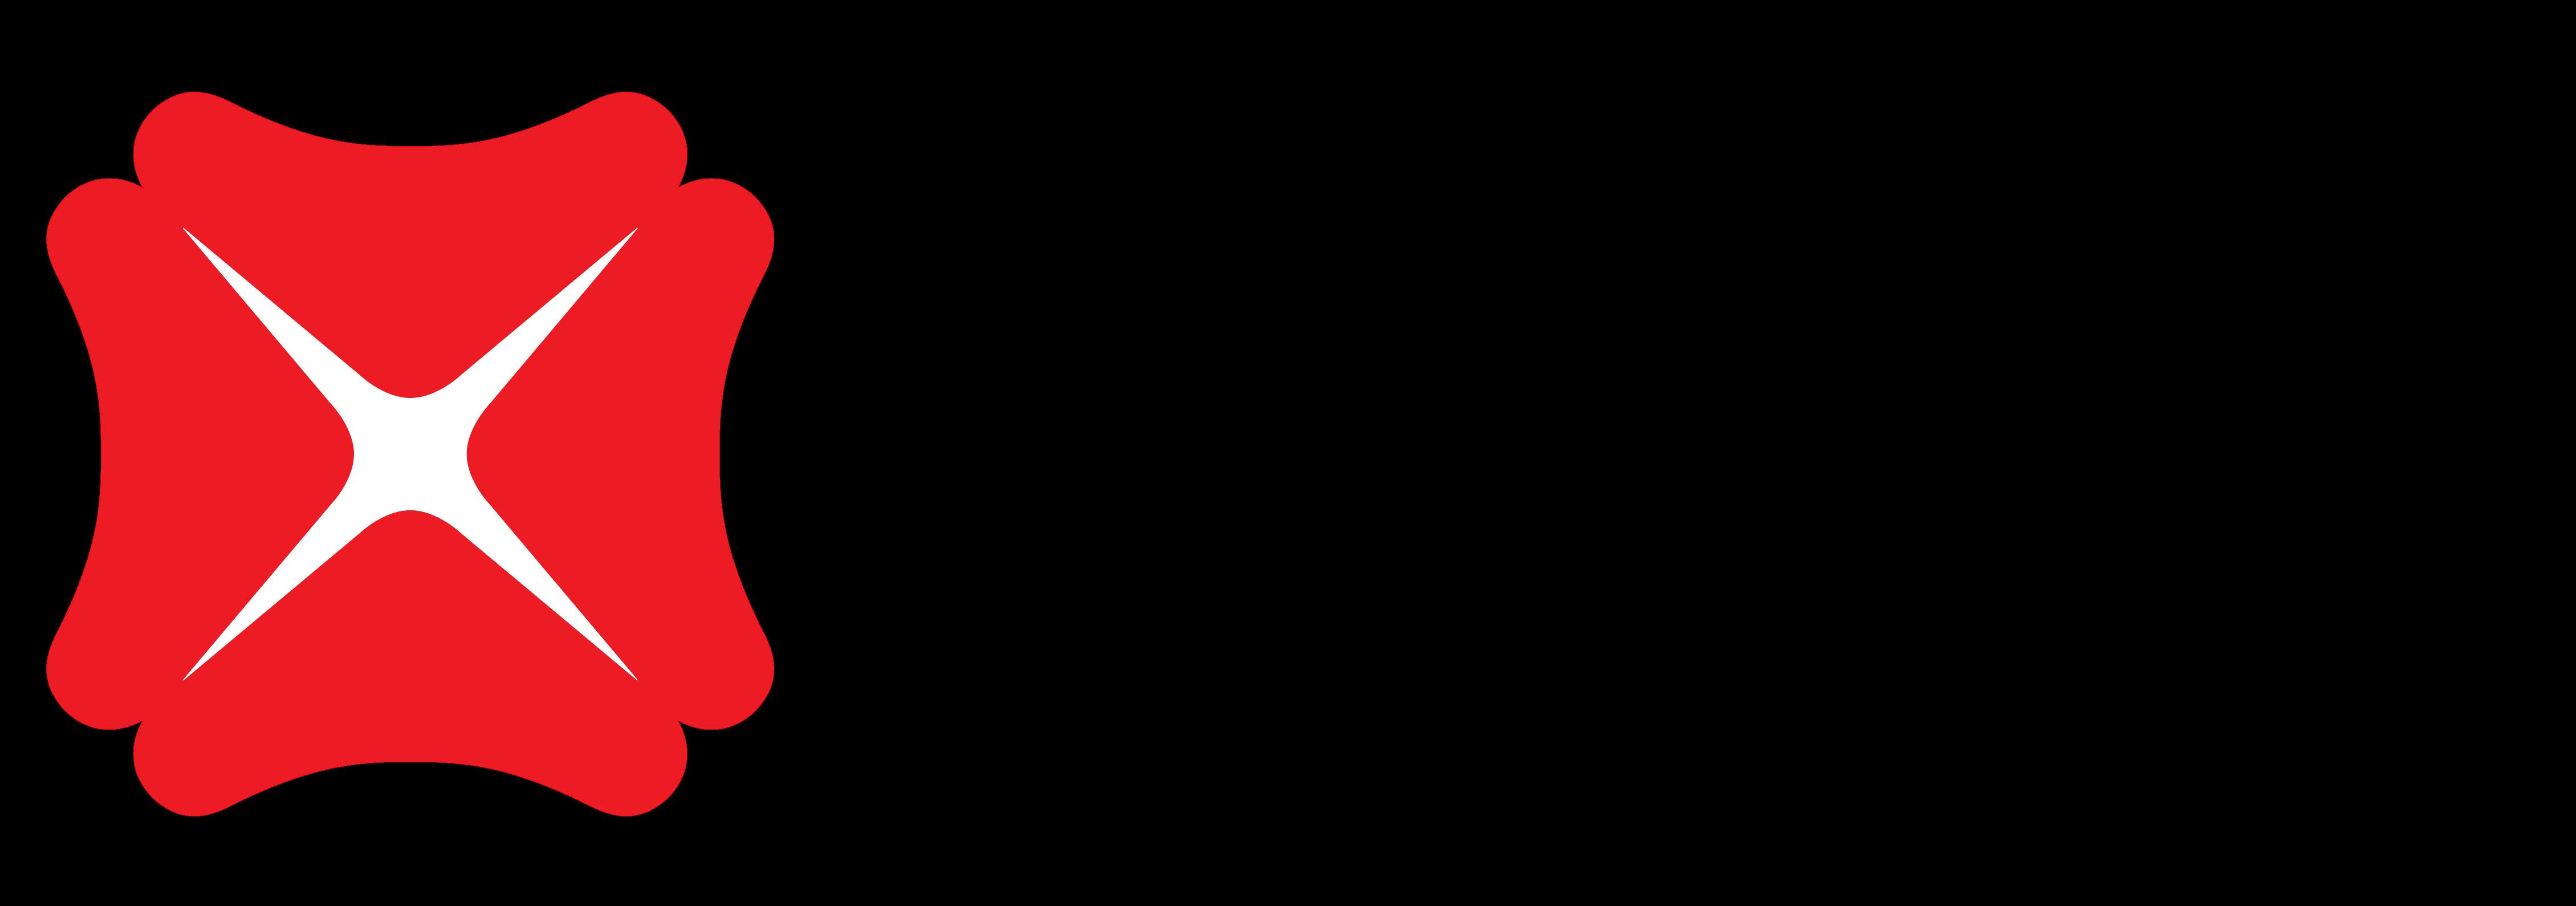 Dbs Logo PNG